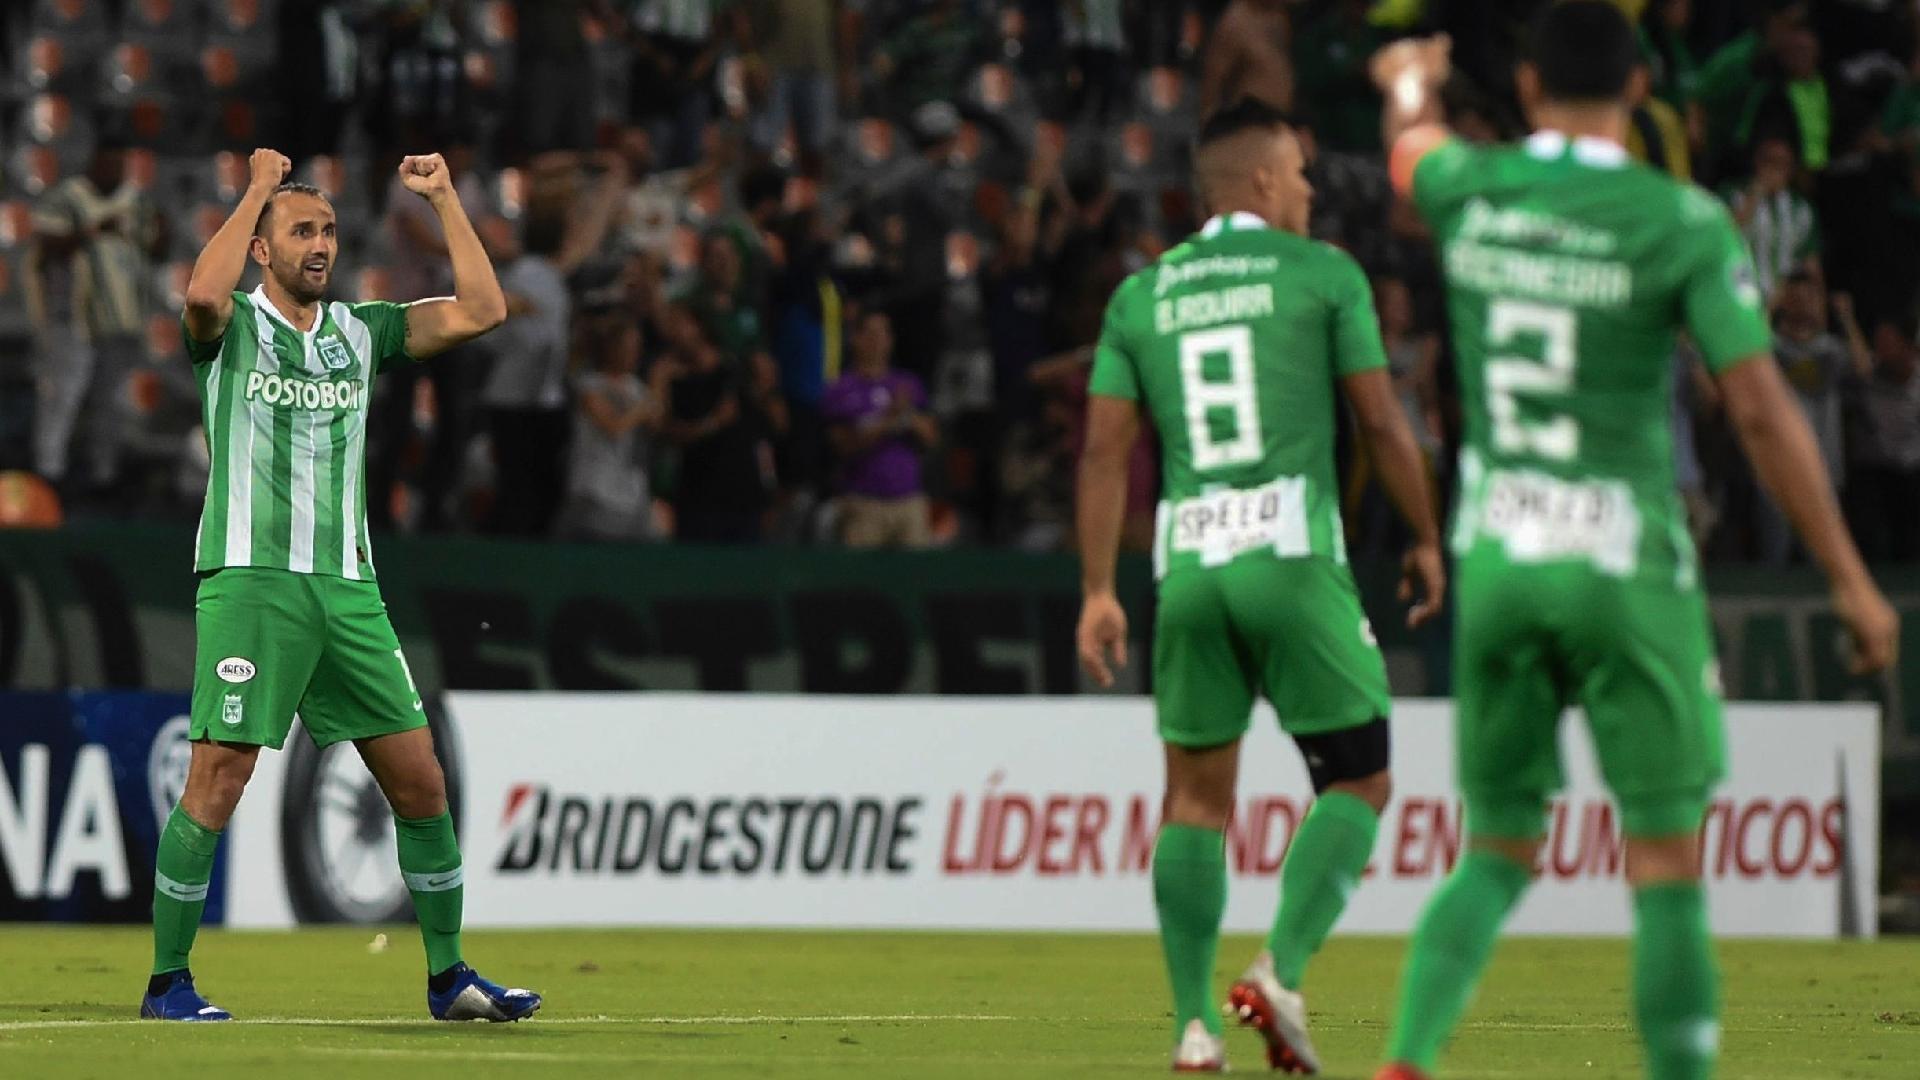 Barcos comemora gol do Atlético Nacional contra o Fluminense